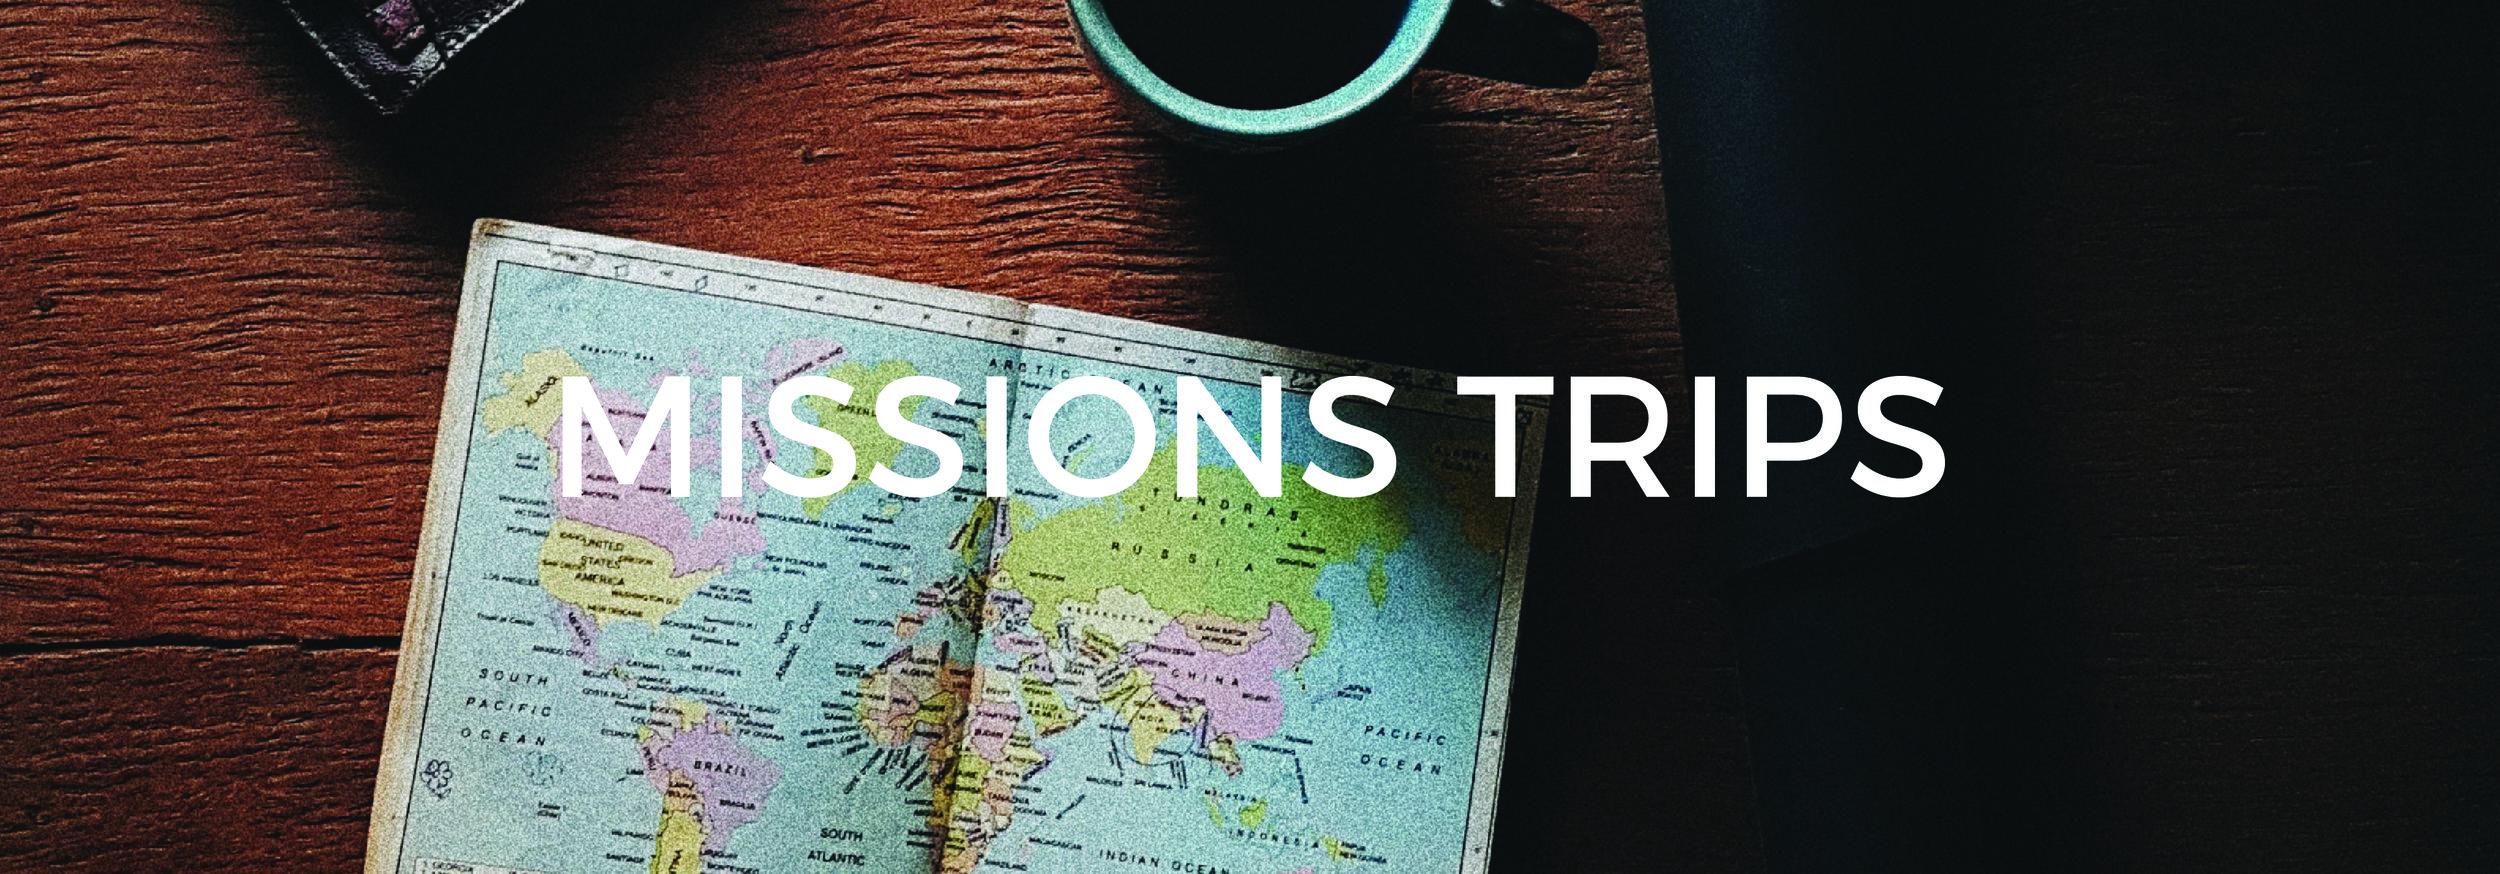 Missions Trips-29.jpg